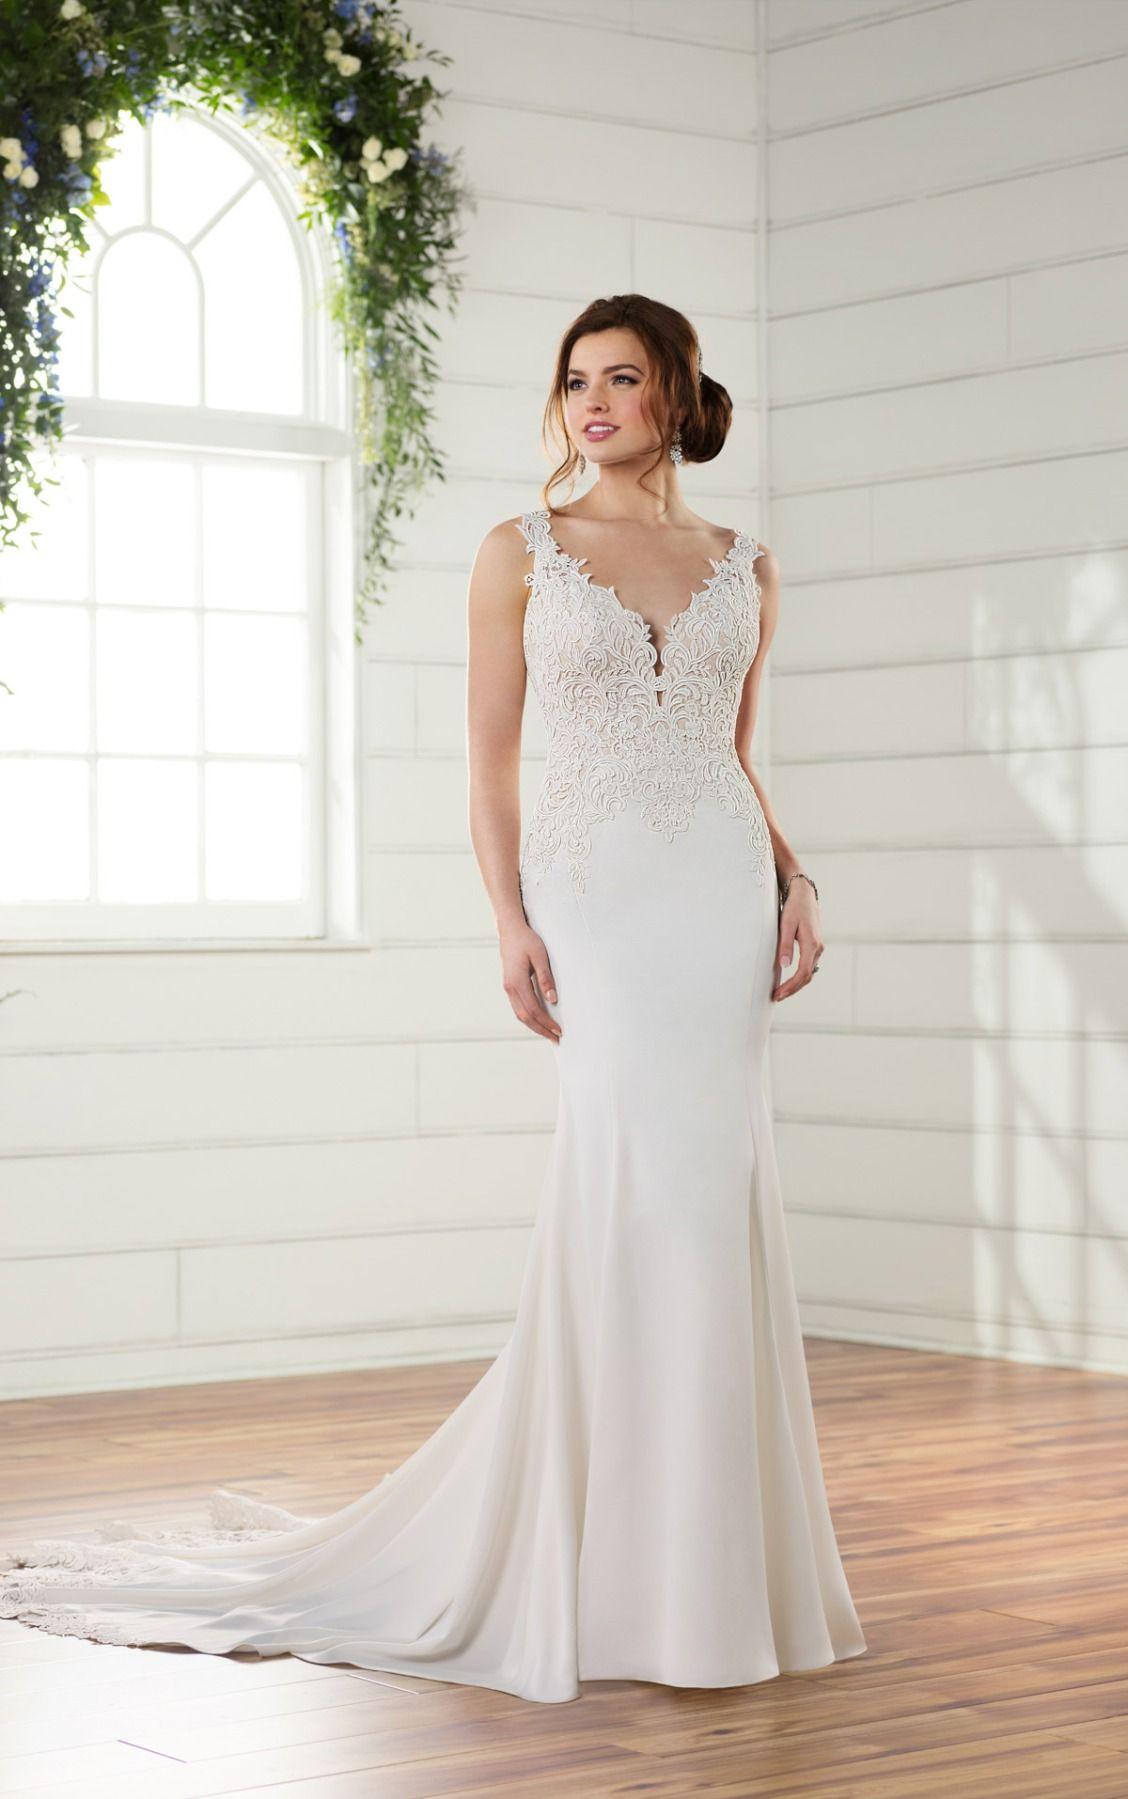 Off-the-Shoulder Lace Wedding Dress | Wedding dress, Lace wedding ...